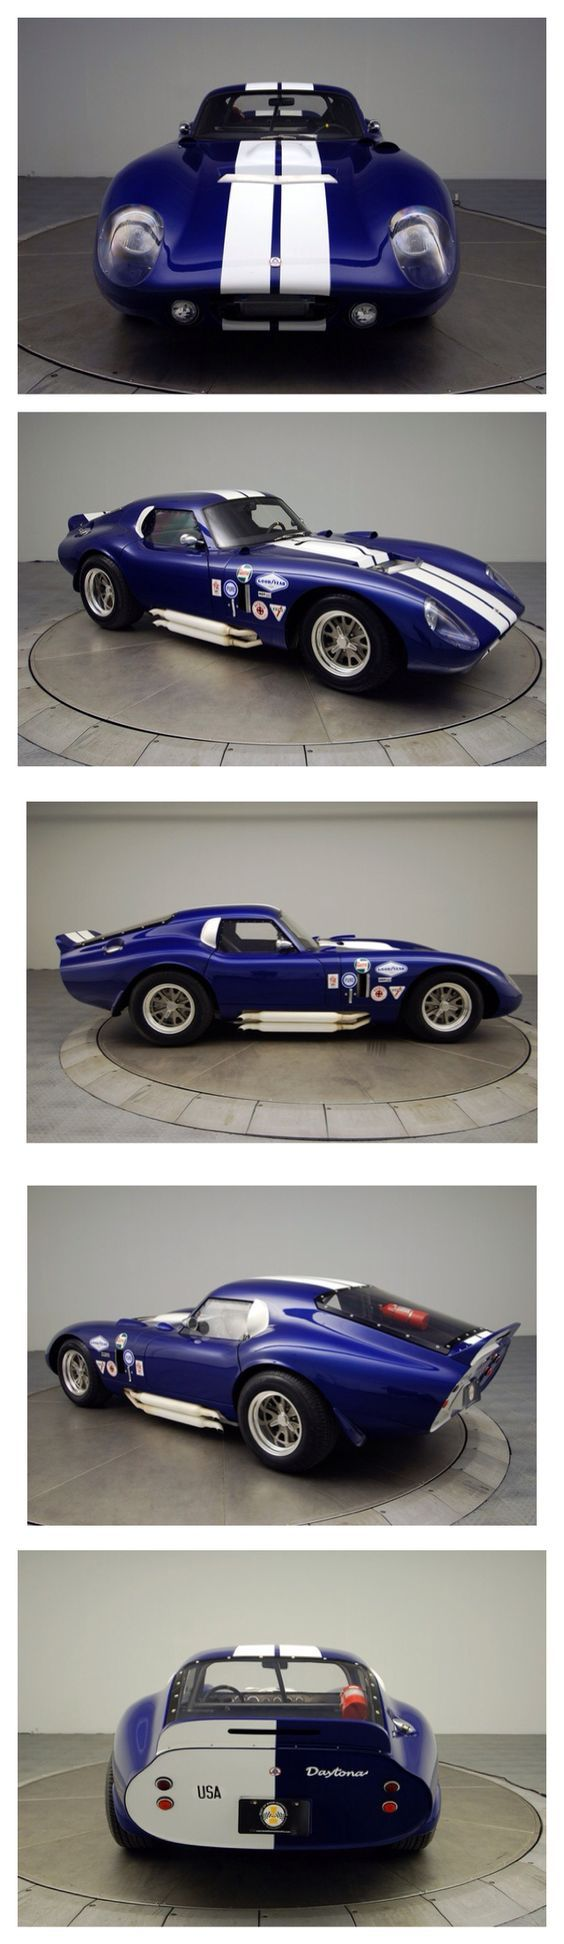 Luxury caravan with full size sports car garage from futuria - Shelby Cobra Daytona Dream Garagecar